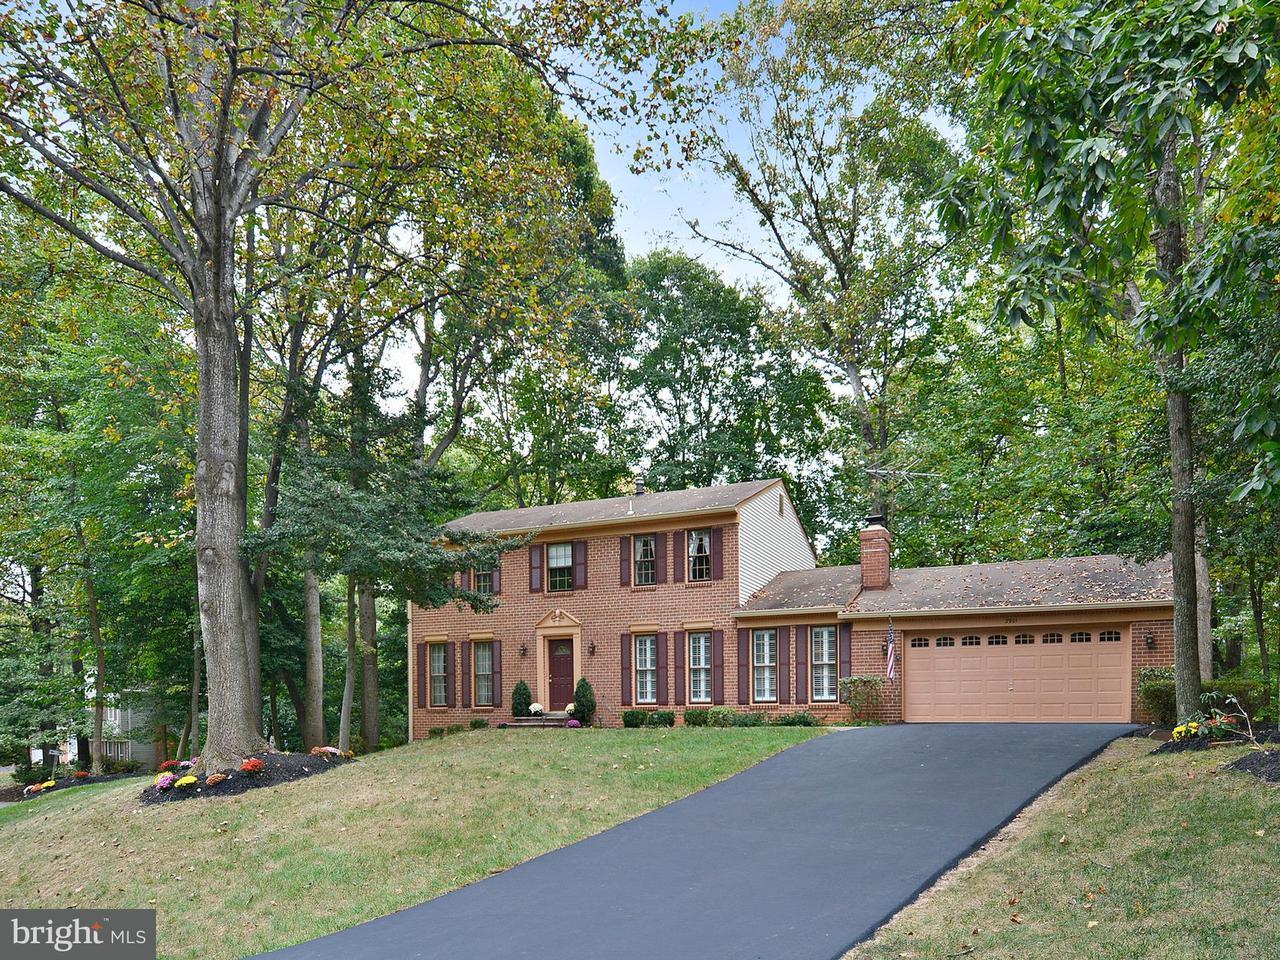 Single Family Home for Sale at 2901 Bree Hill Road 2901 Bree Hill Road Oakton, Virginia 22124 United States